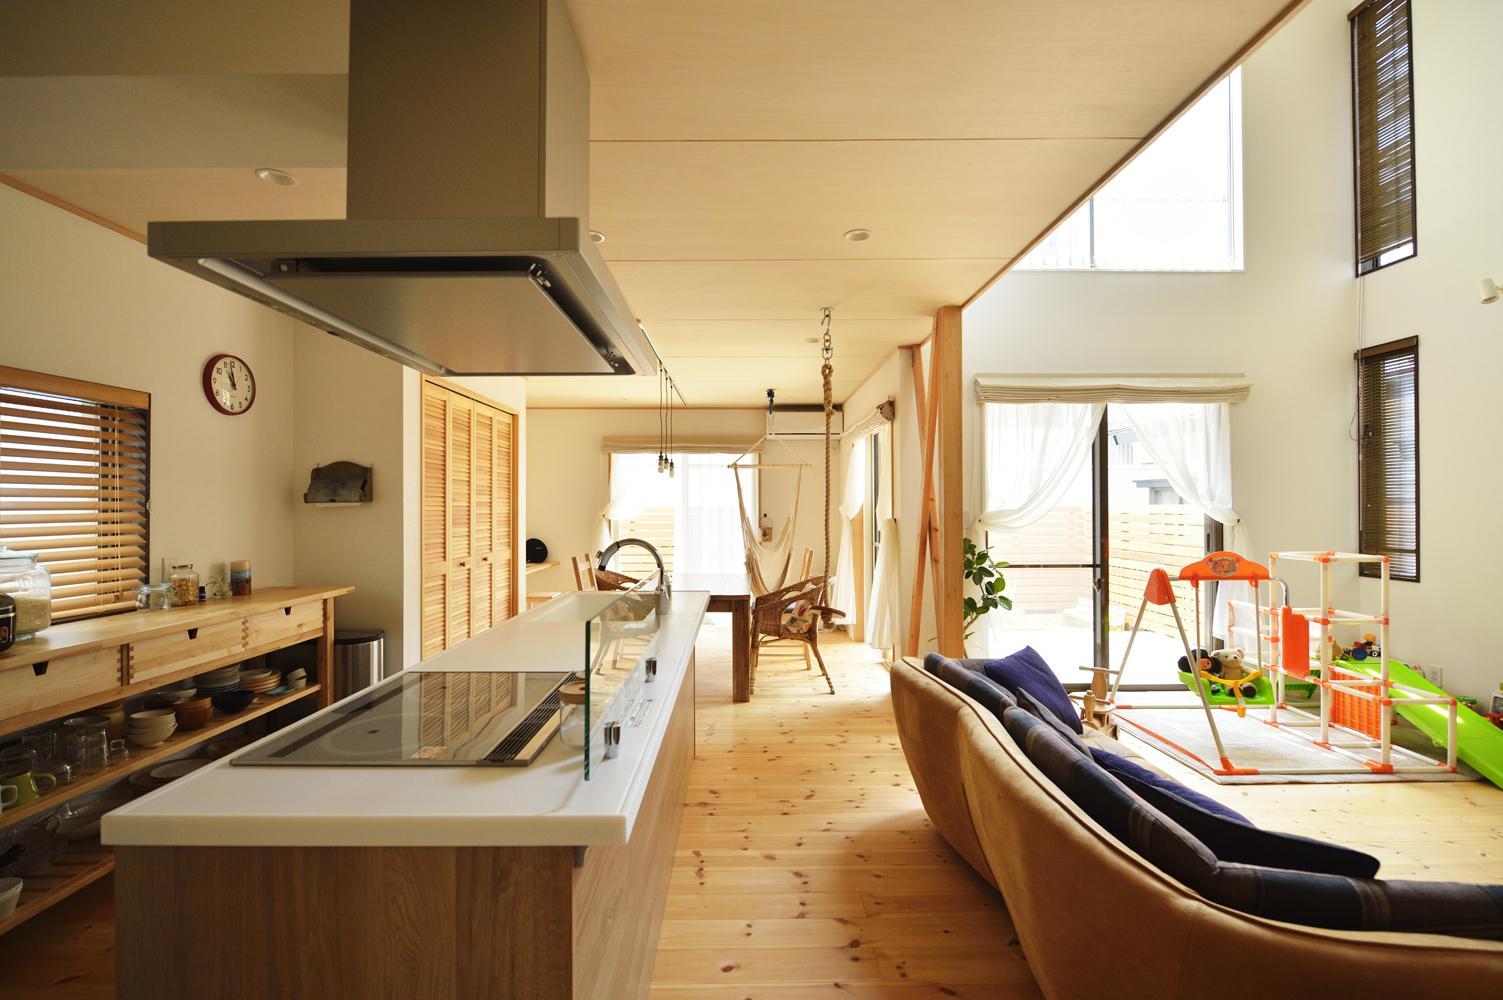 S邸・「解放感!」吹き抜けのある家の写真 光と風を通す明るく開放的なLDK